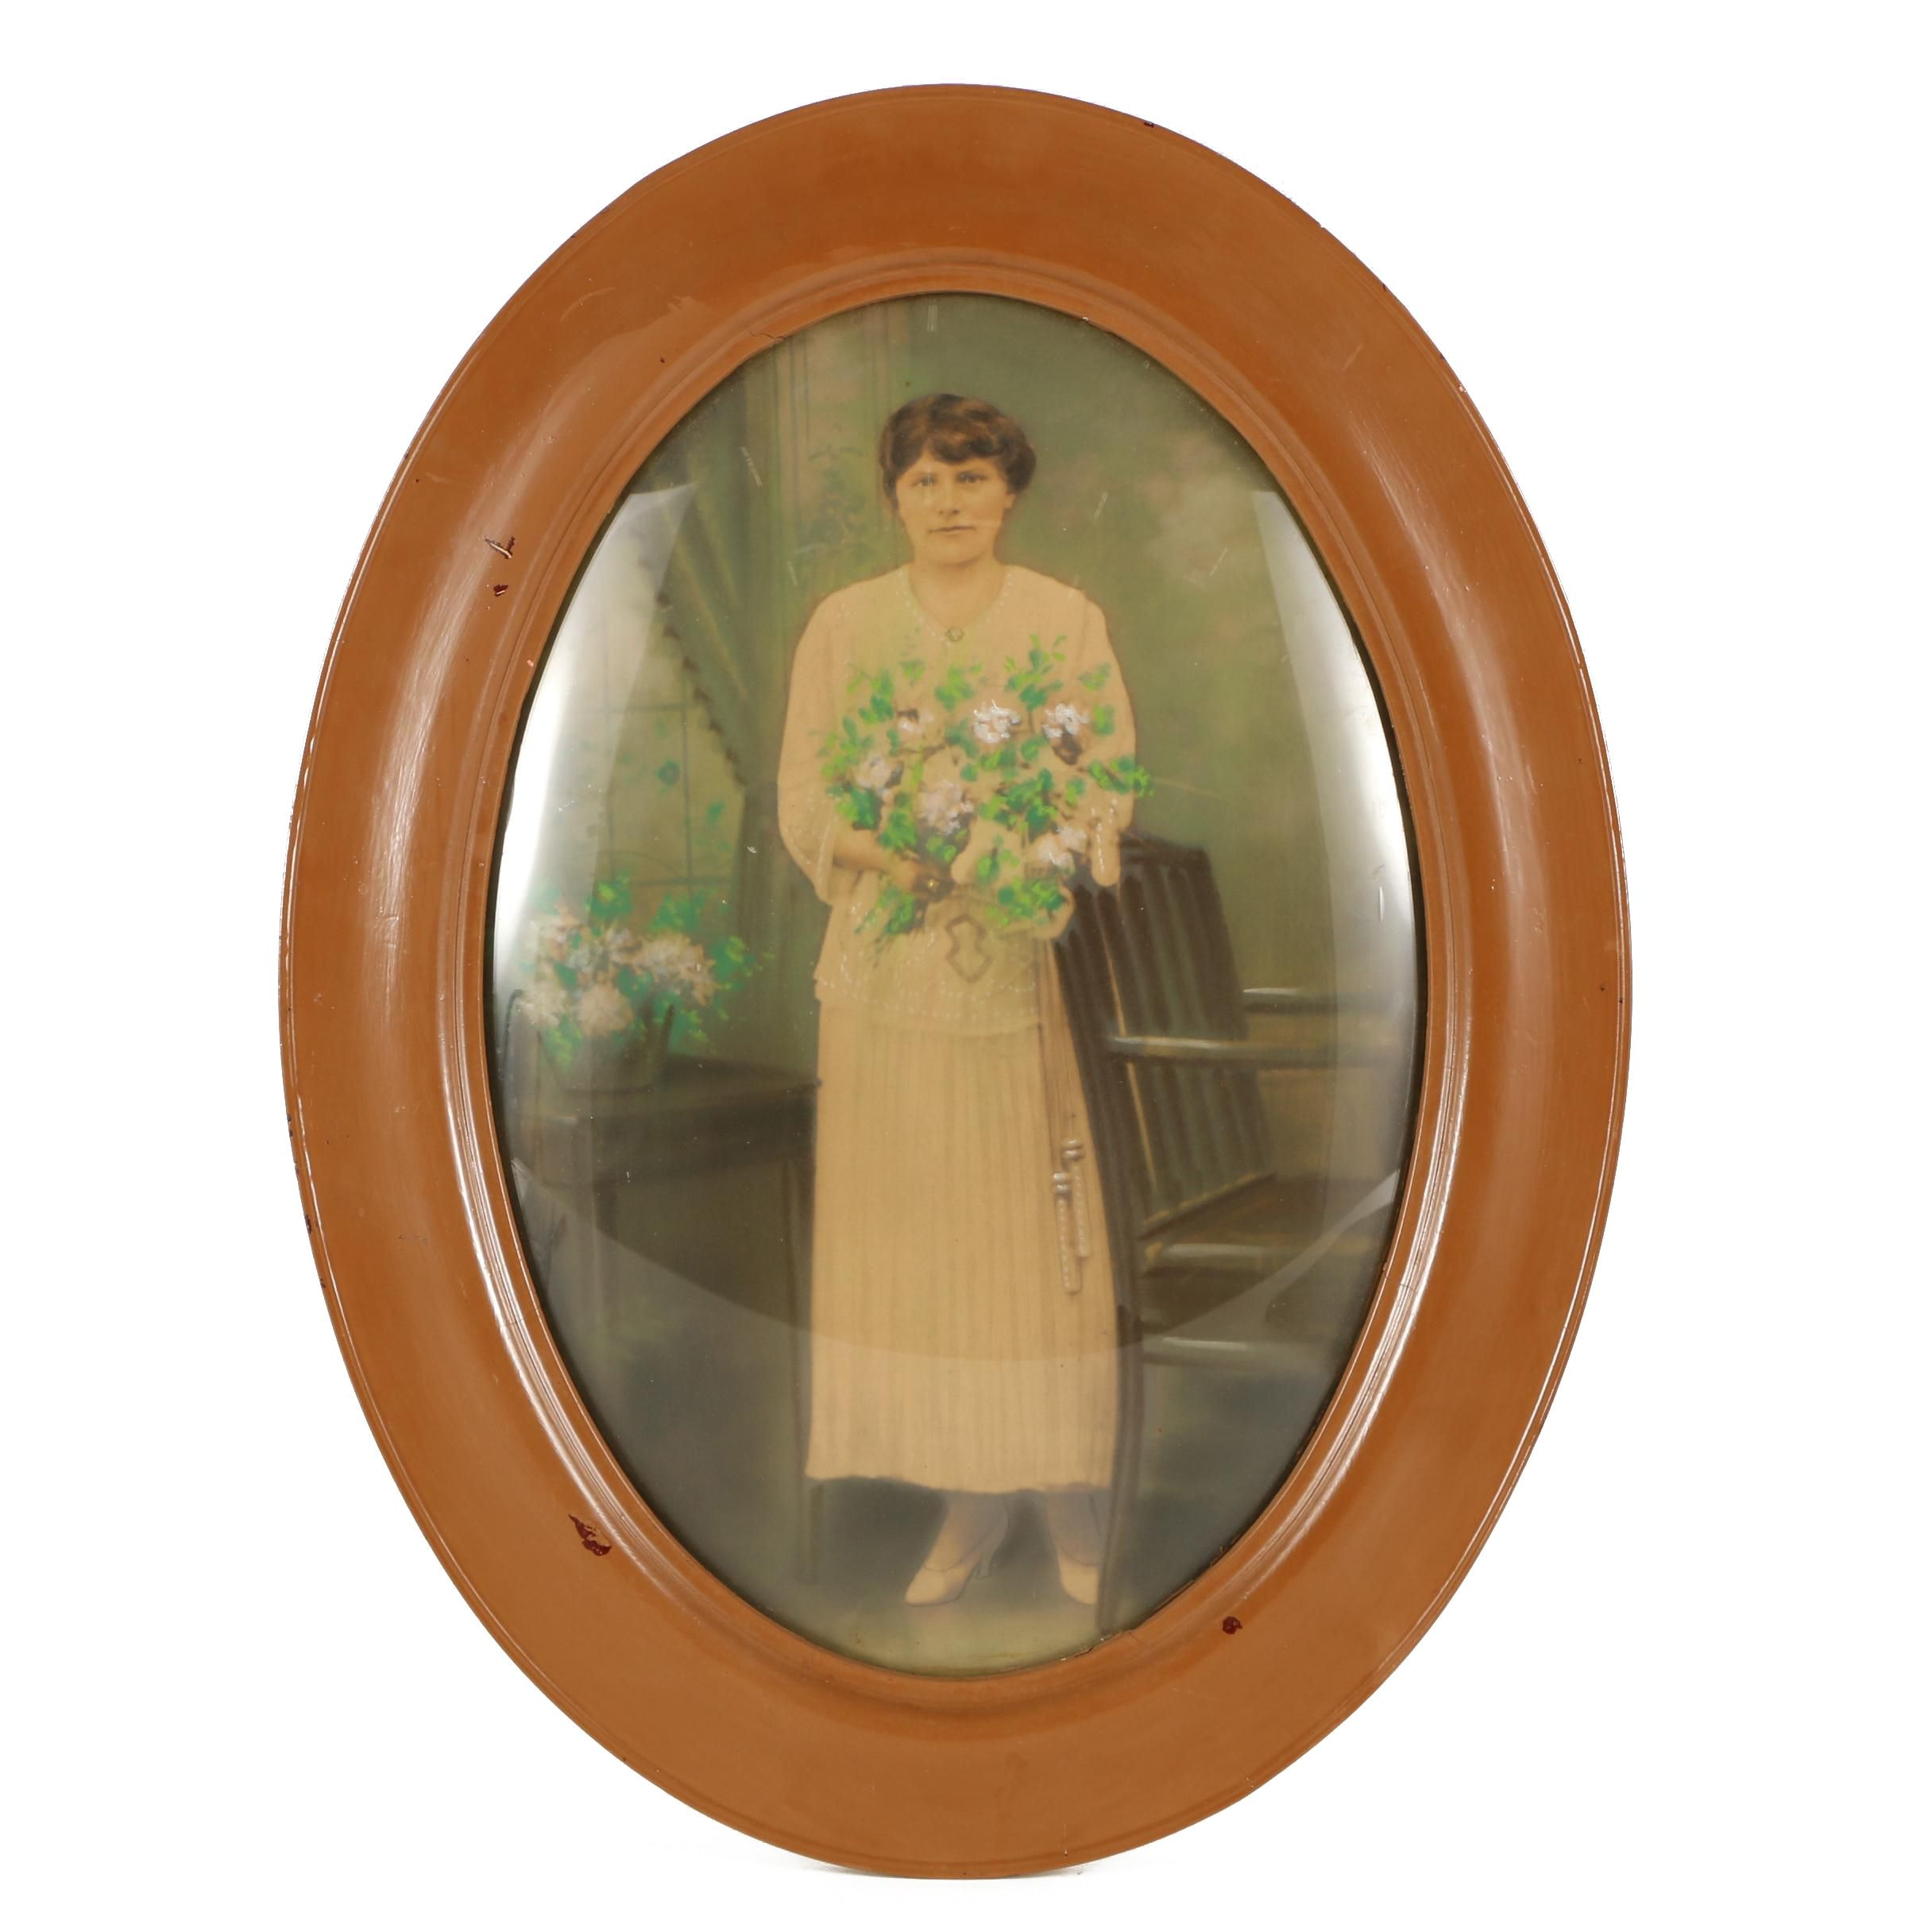 Antique 19th-Century Hand-Tinted Photographic Portrait